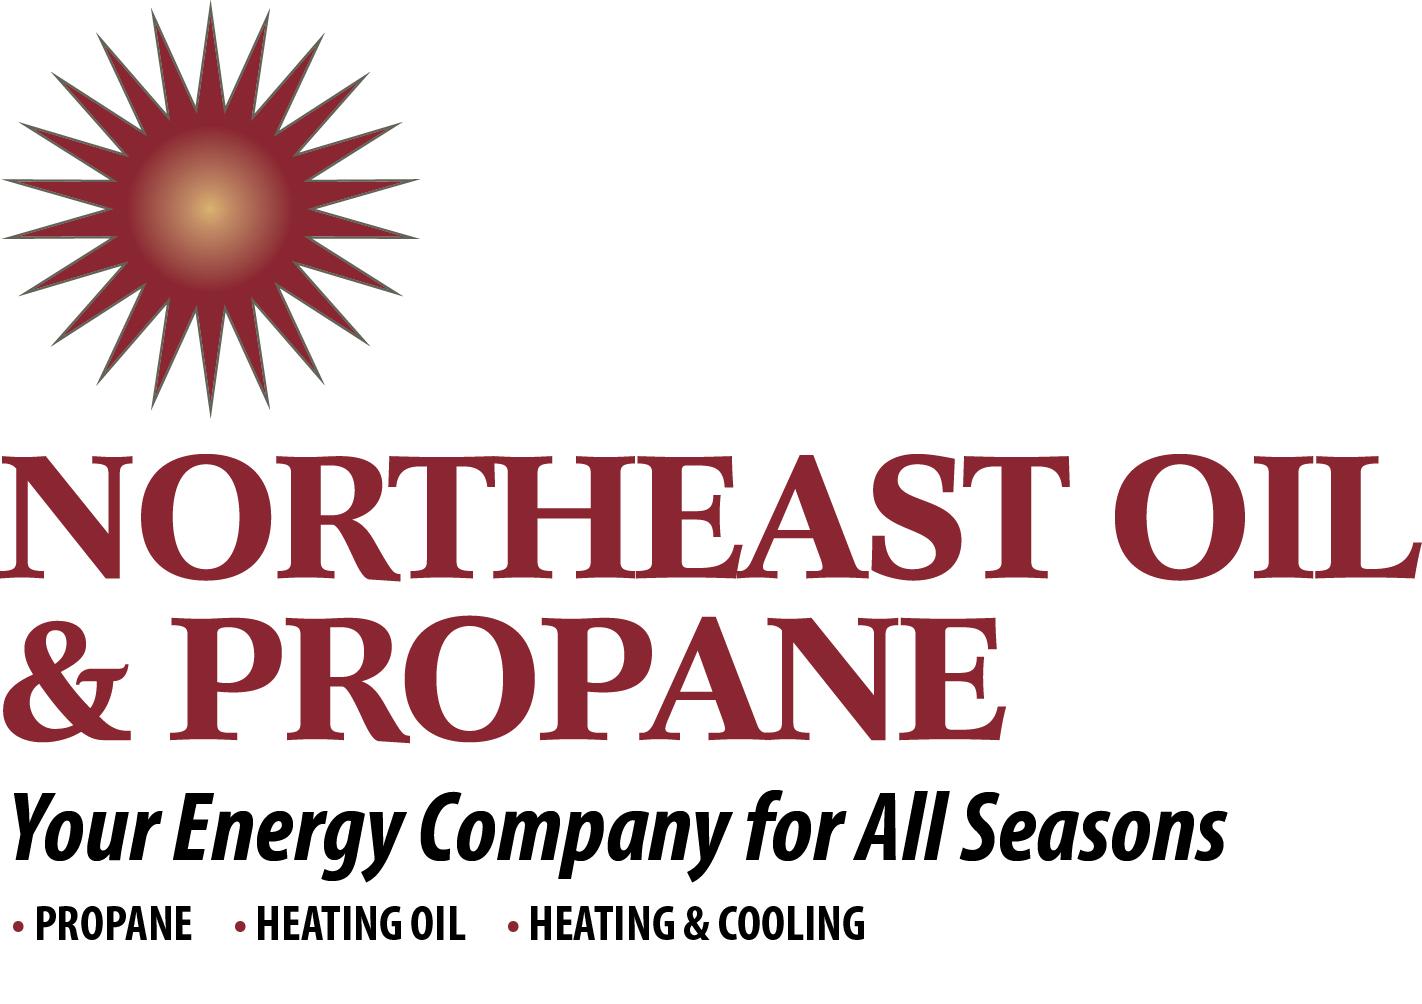 Northeast Oil & Propane